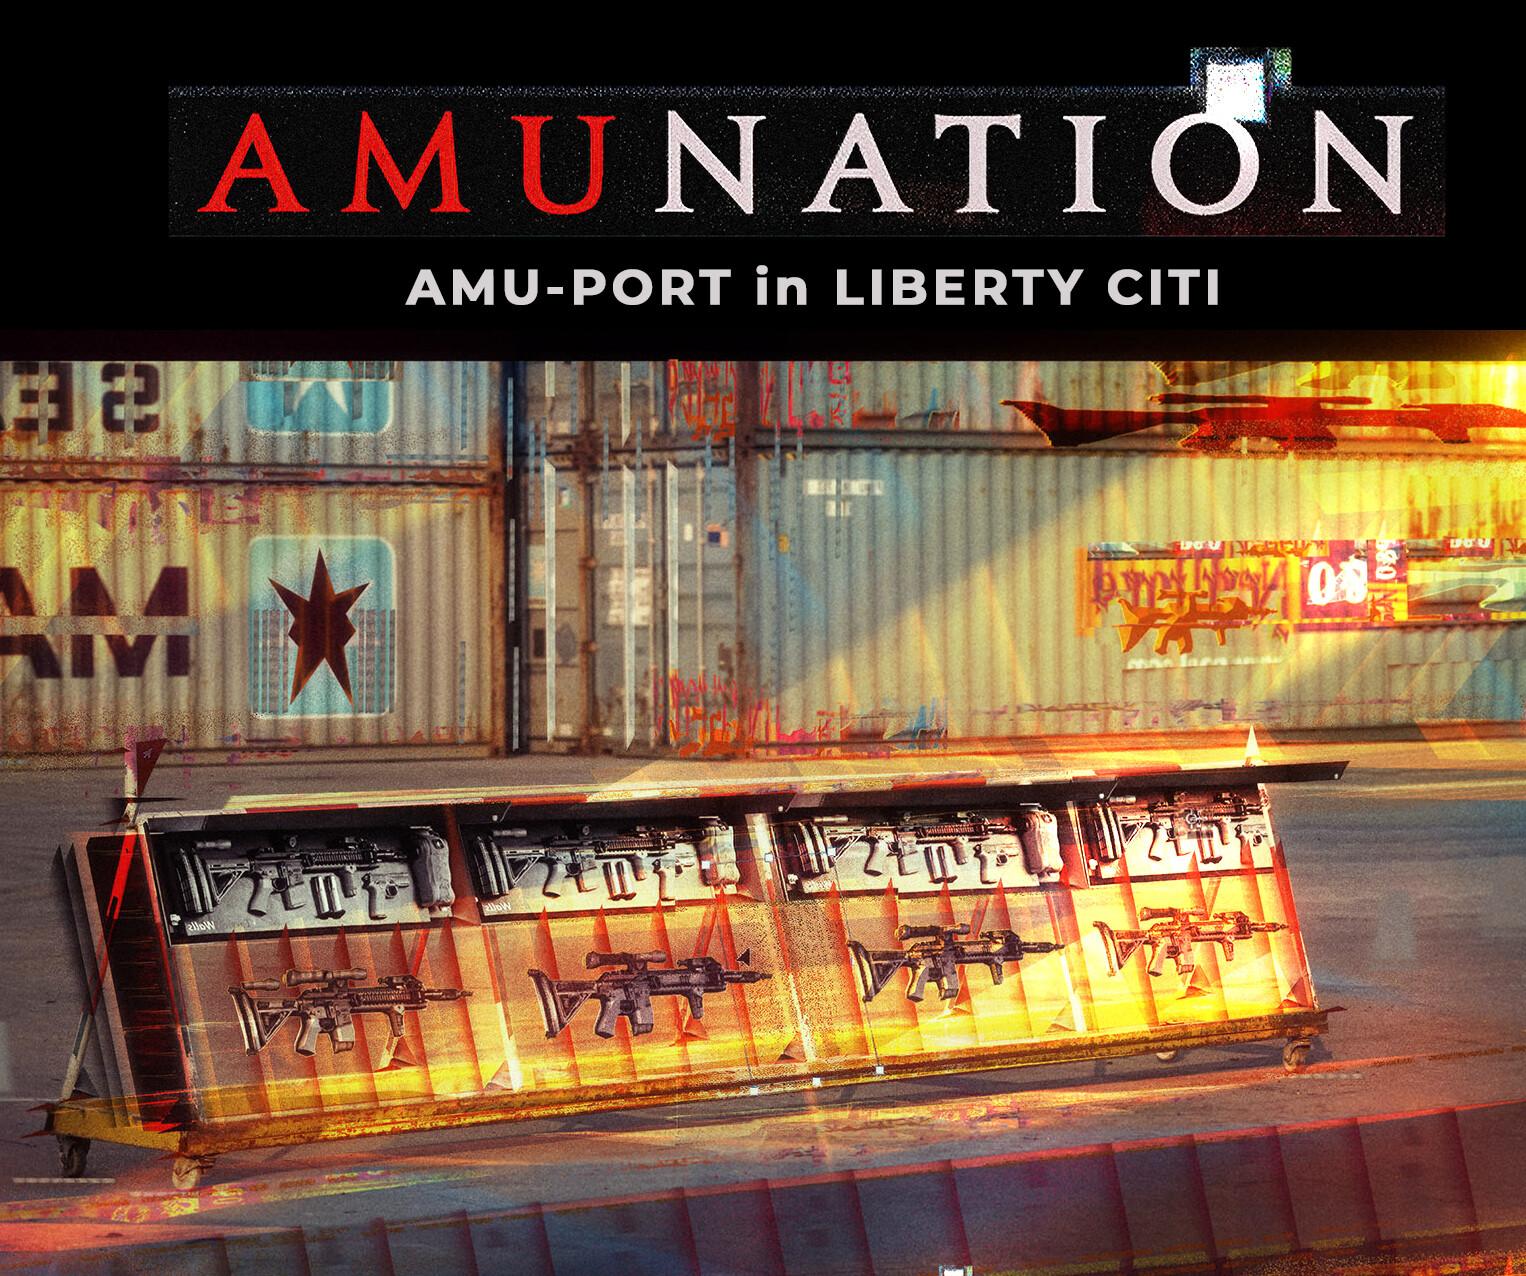 AMU-PORT in Liberty City.